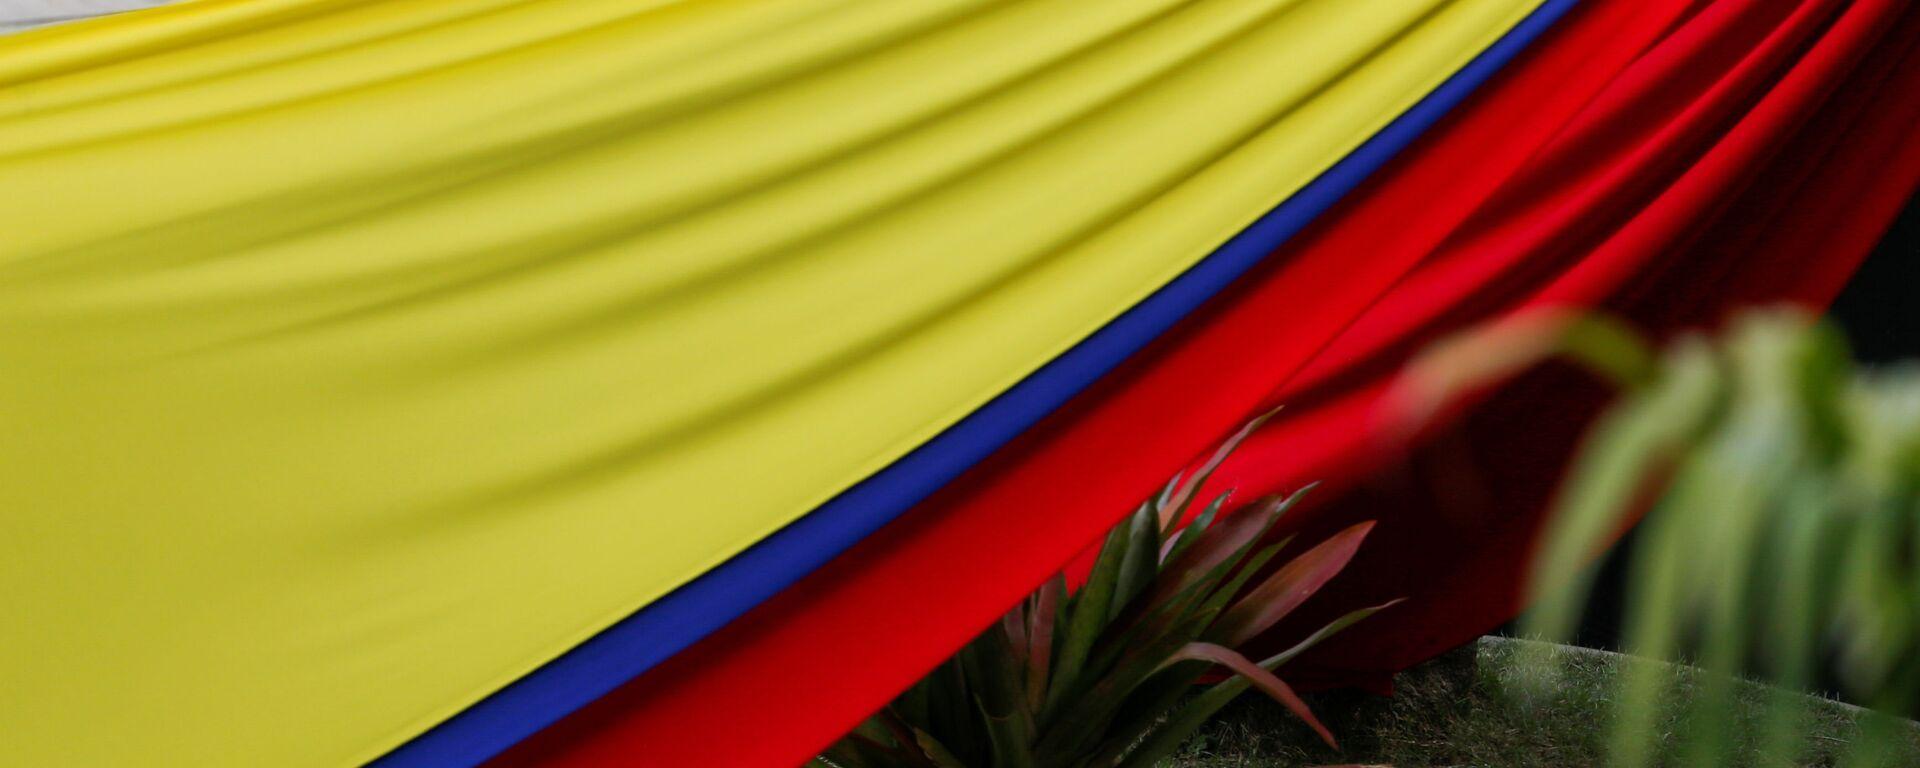 Bandera de Venezuela - Sputnik Mundo, 1920, 28.01.2021